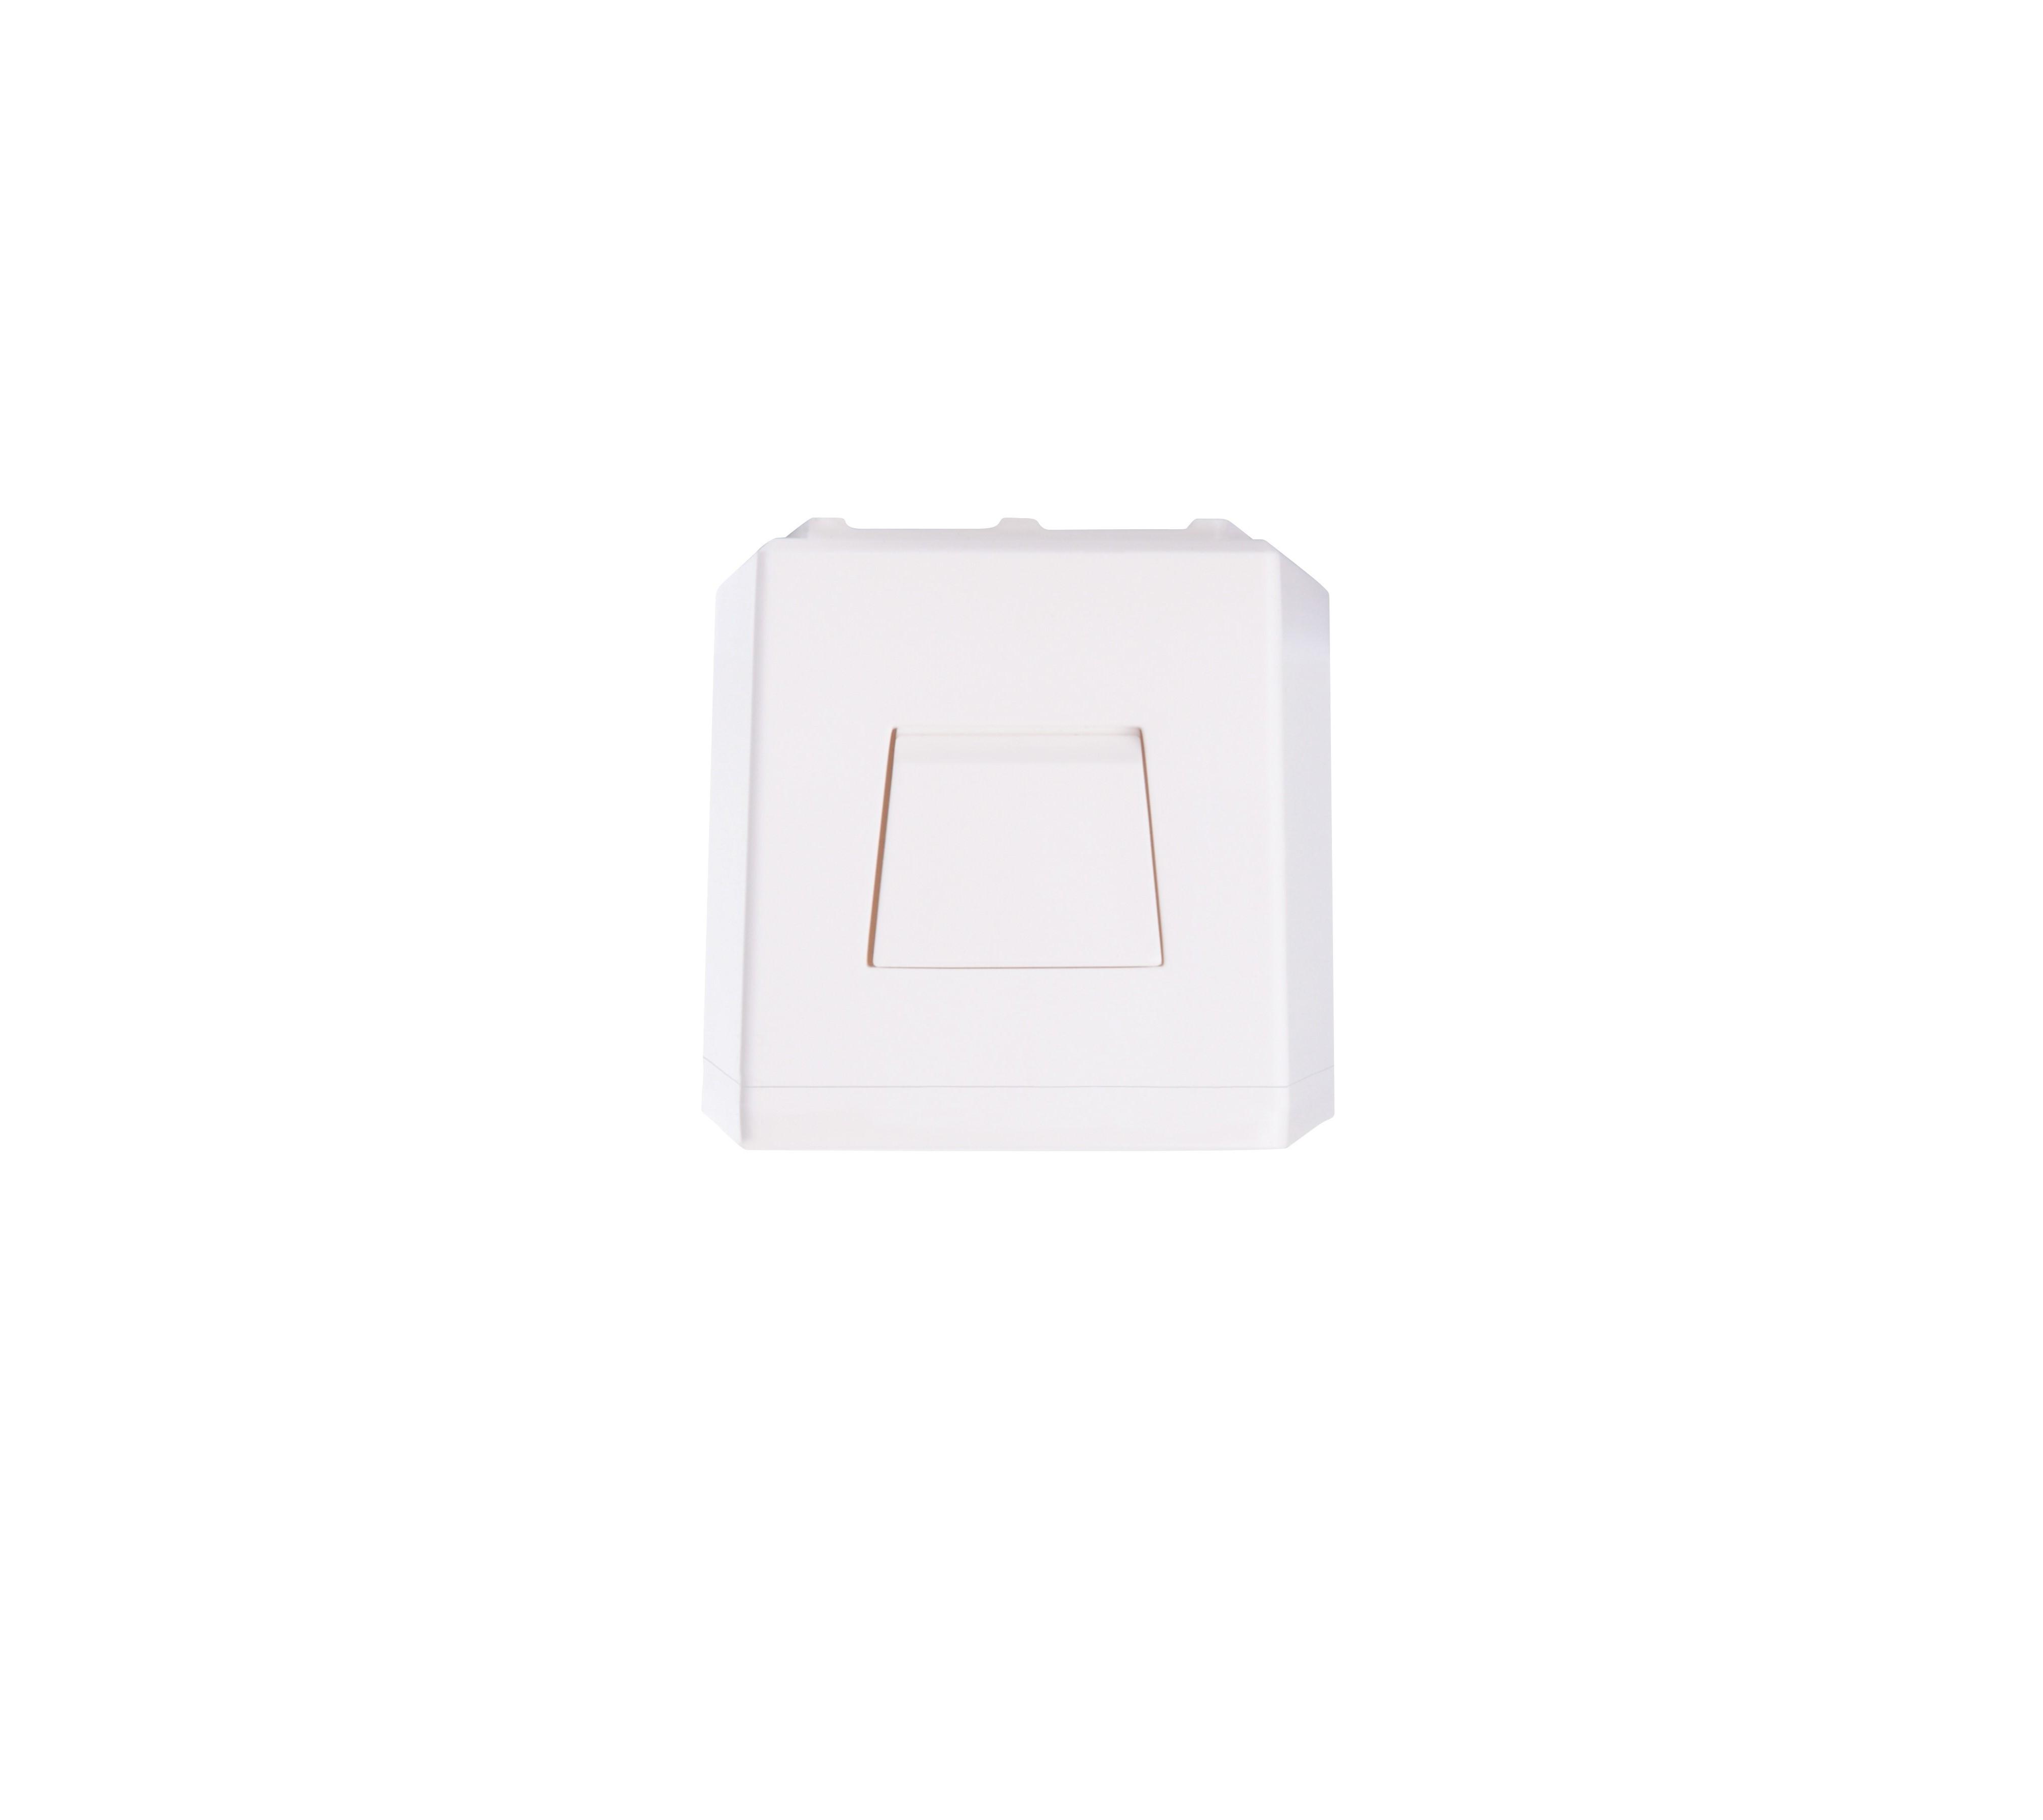 Lampa emergenta led Intelight 94719   3h nementinut test automat1